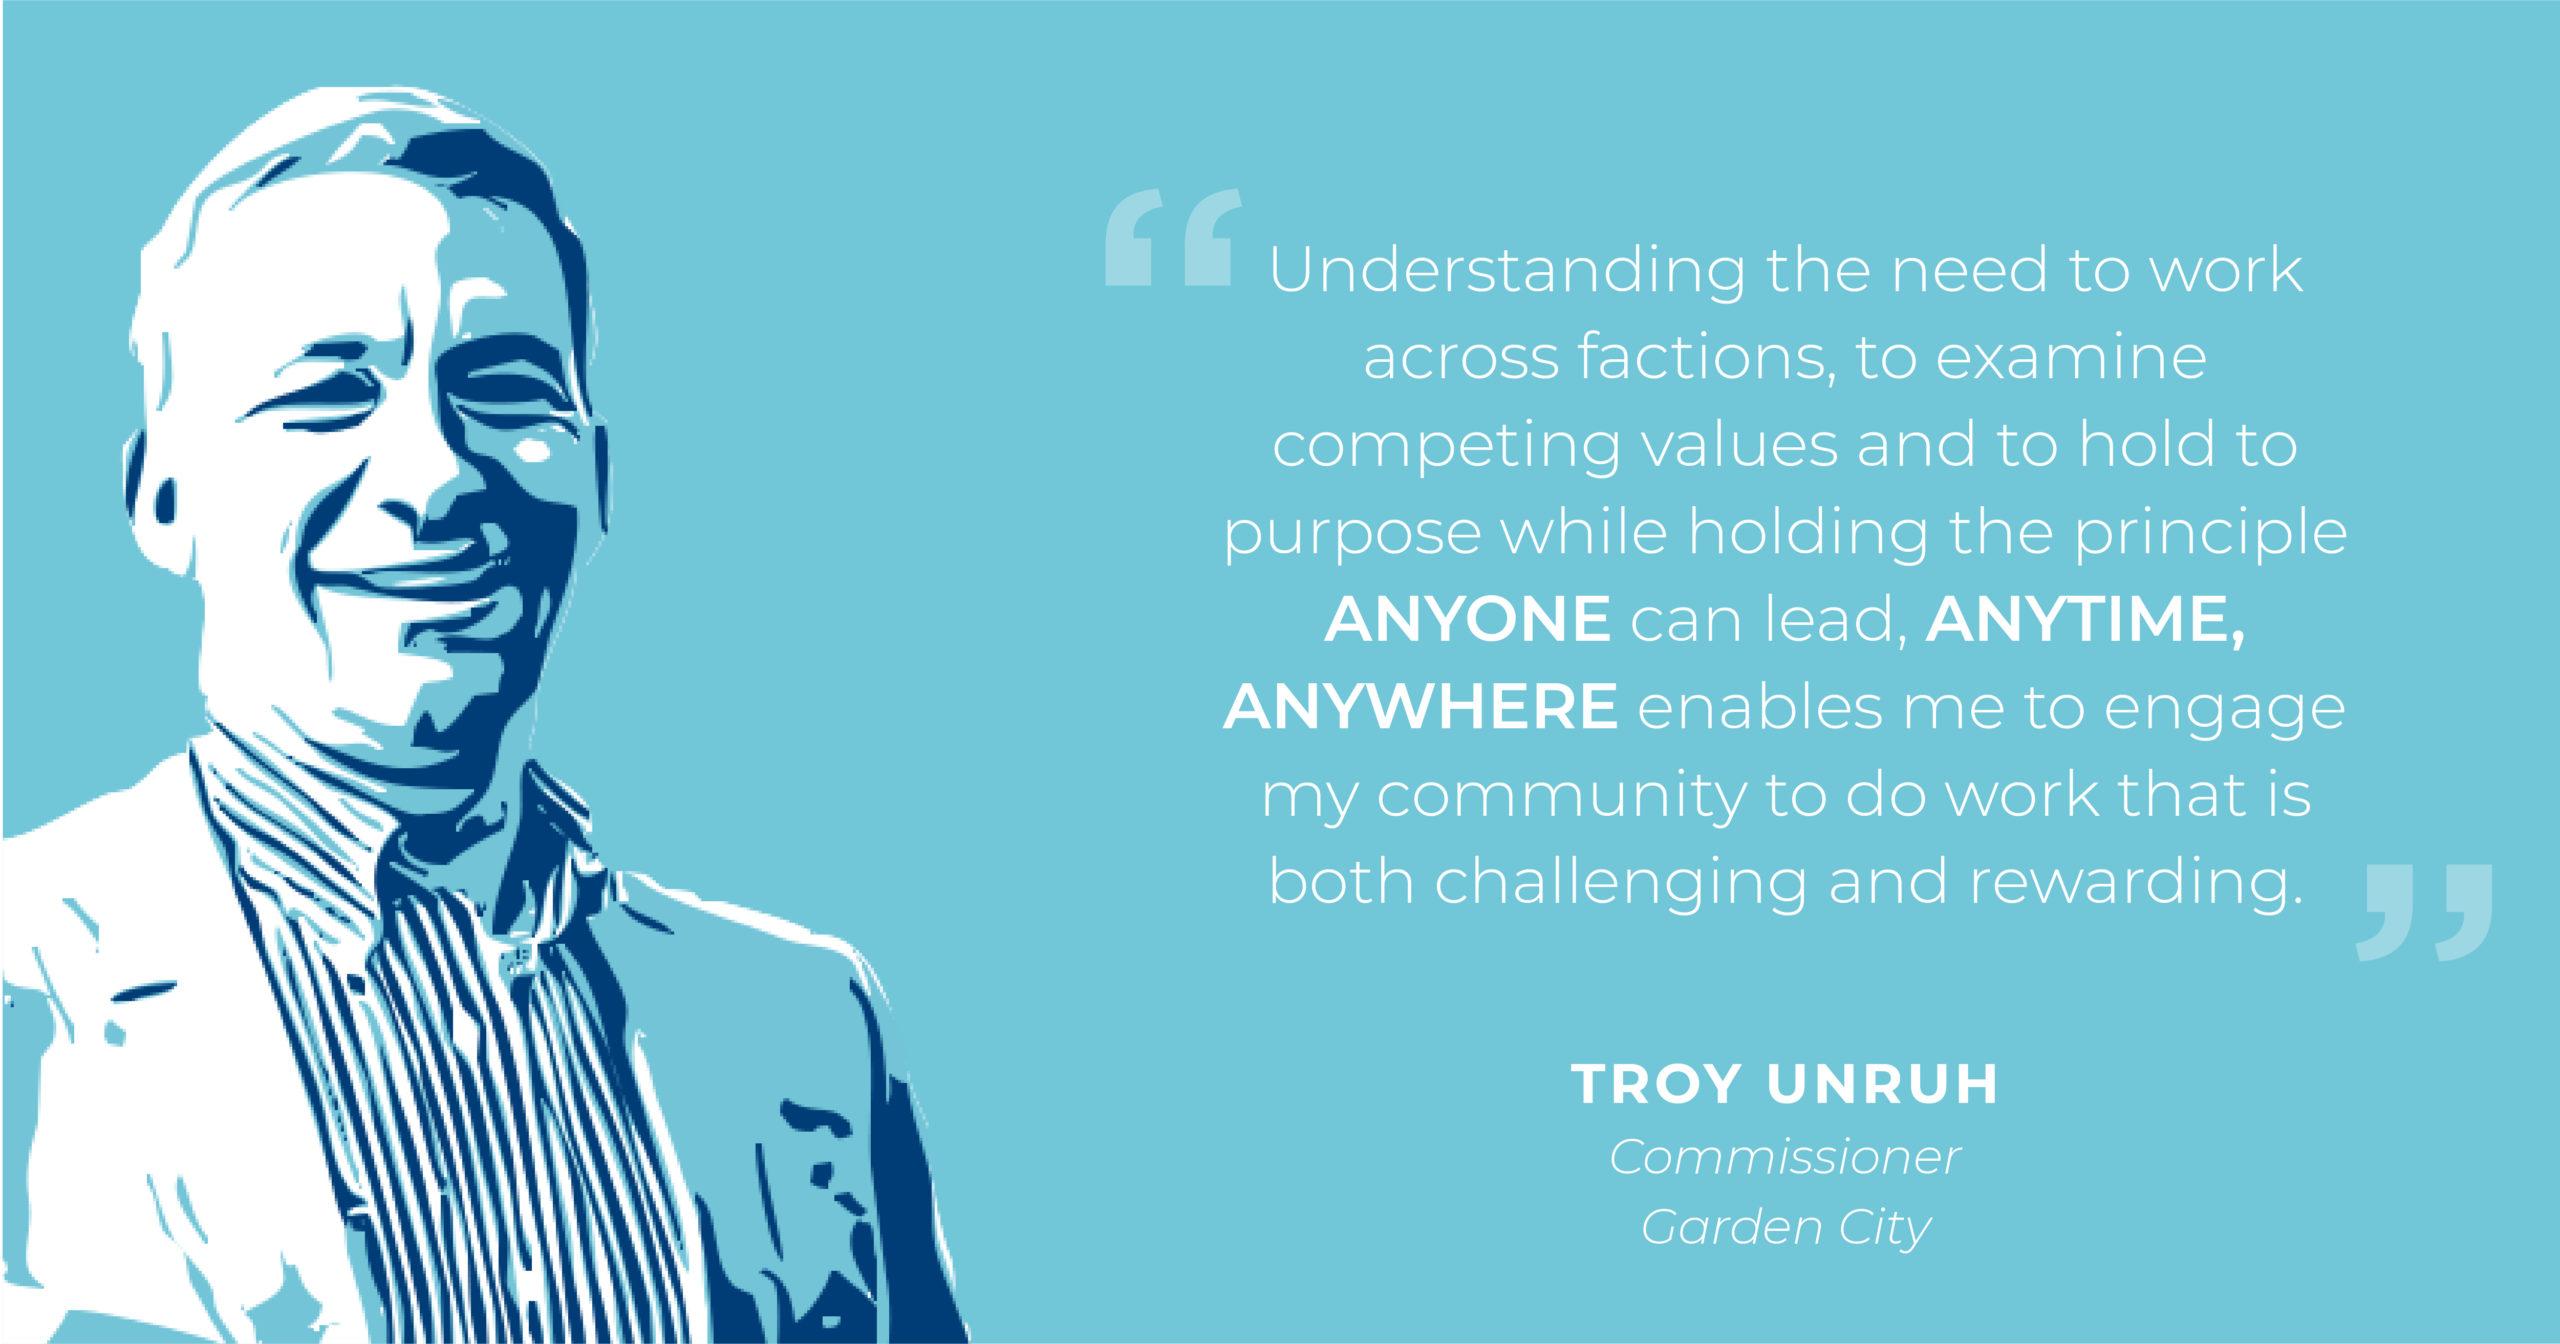 Troy Unruh